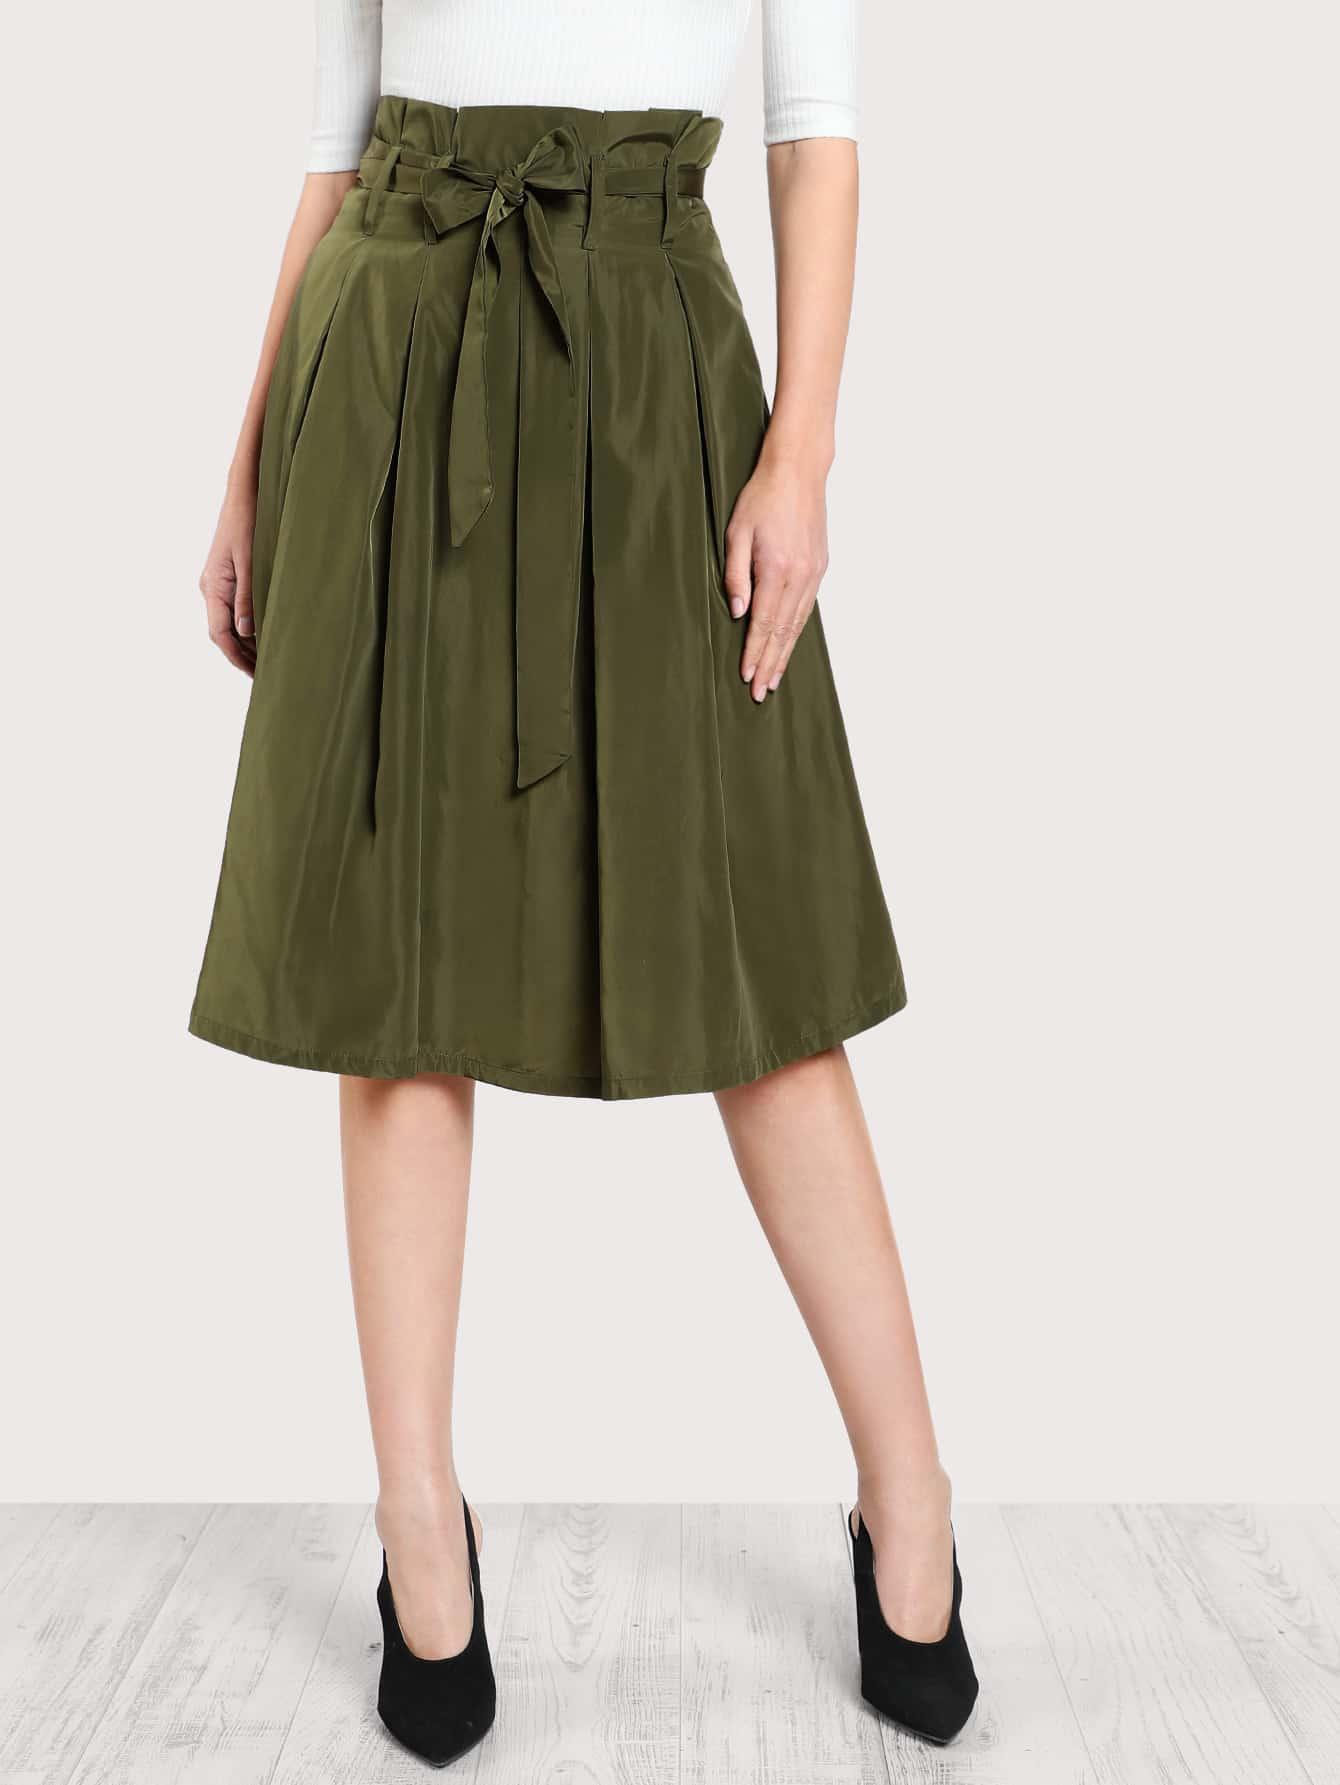 Bow Tie Waist Box Pleated Skirt box pleated grid skirt